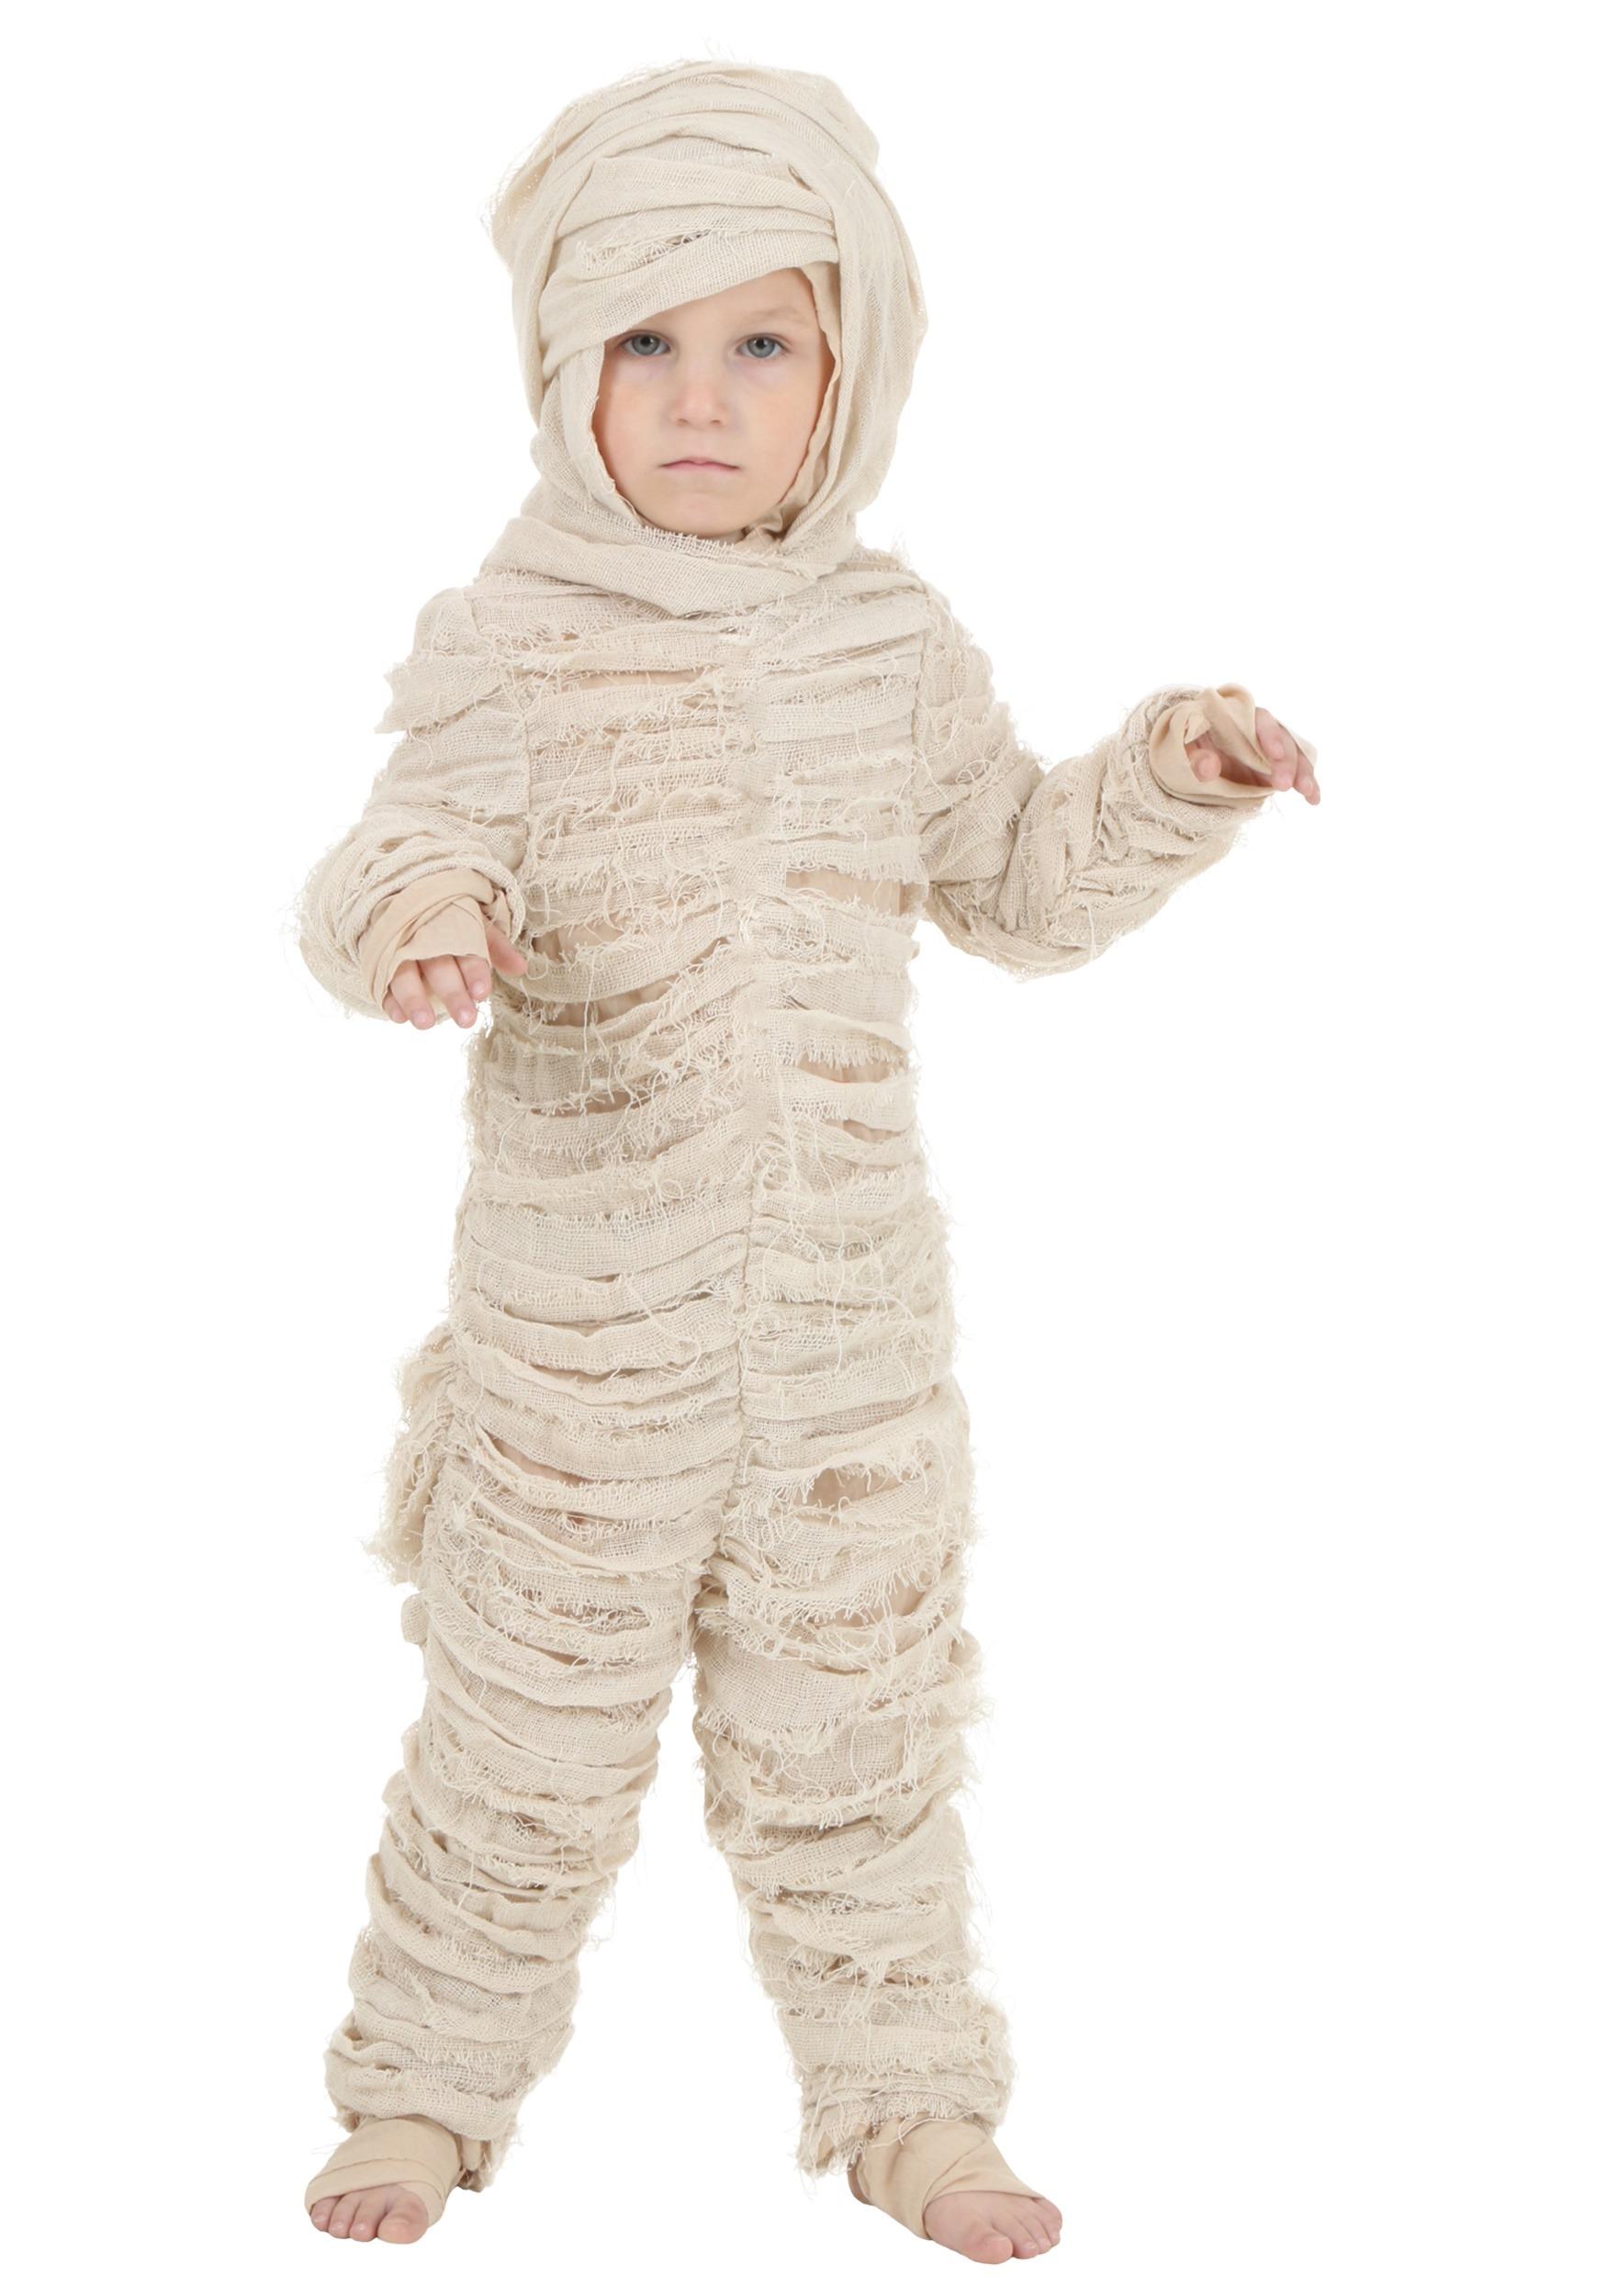 Mummy Toddler Costume